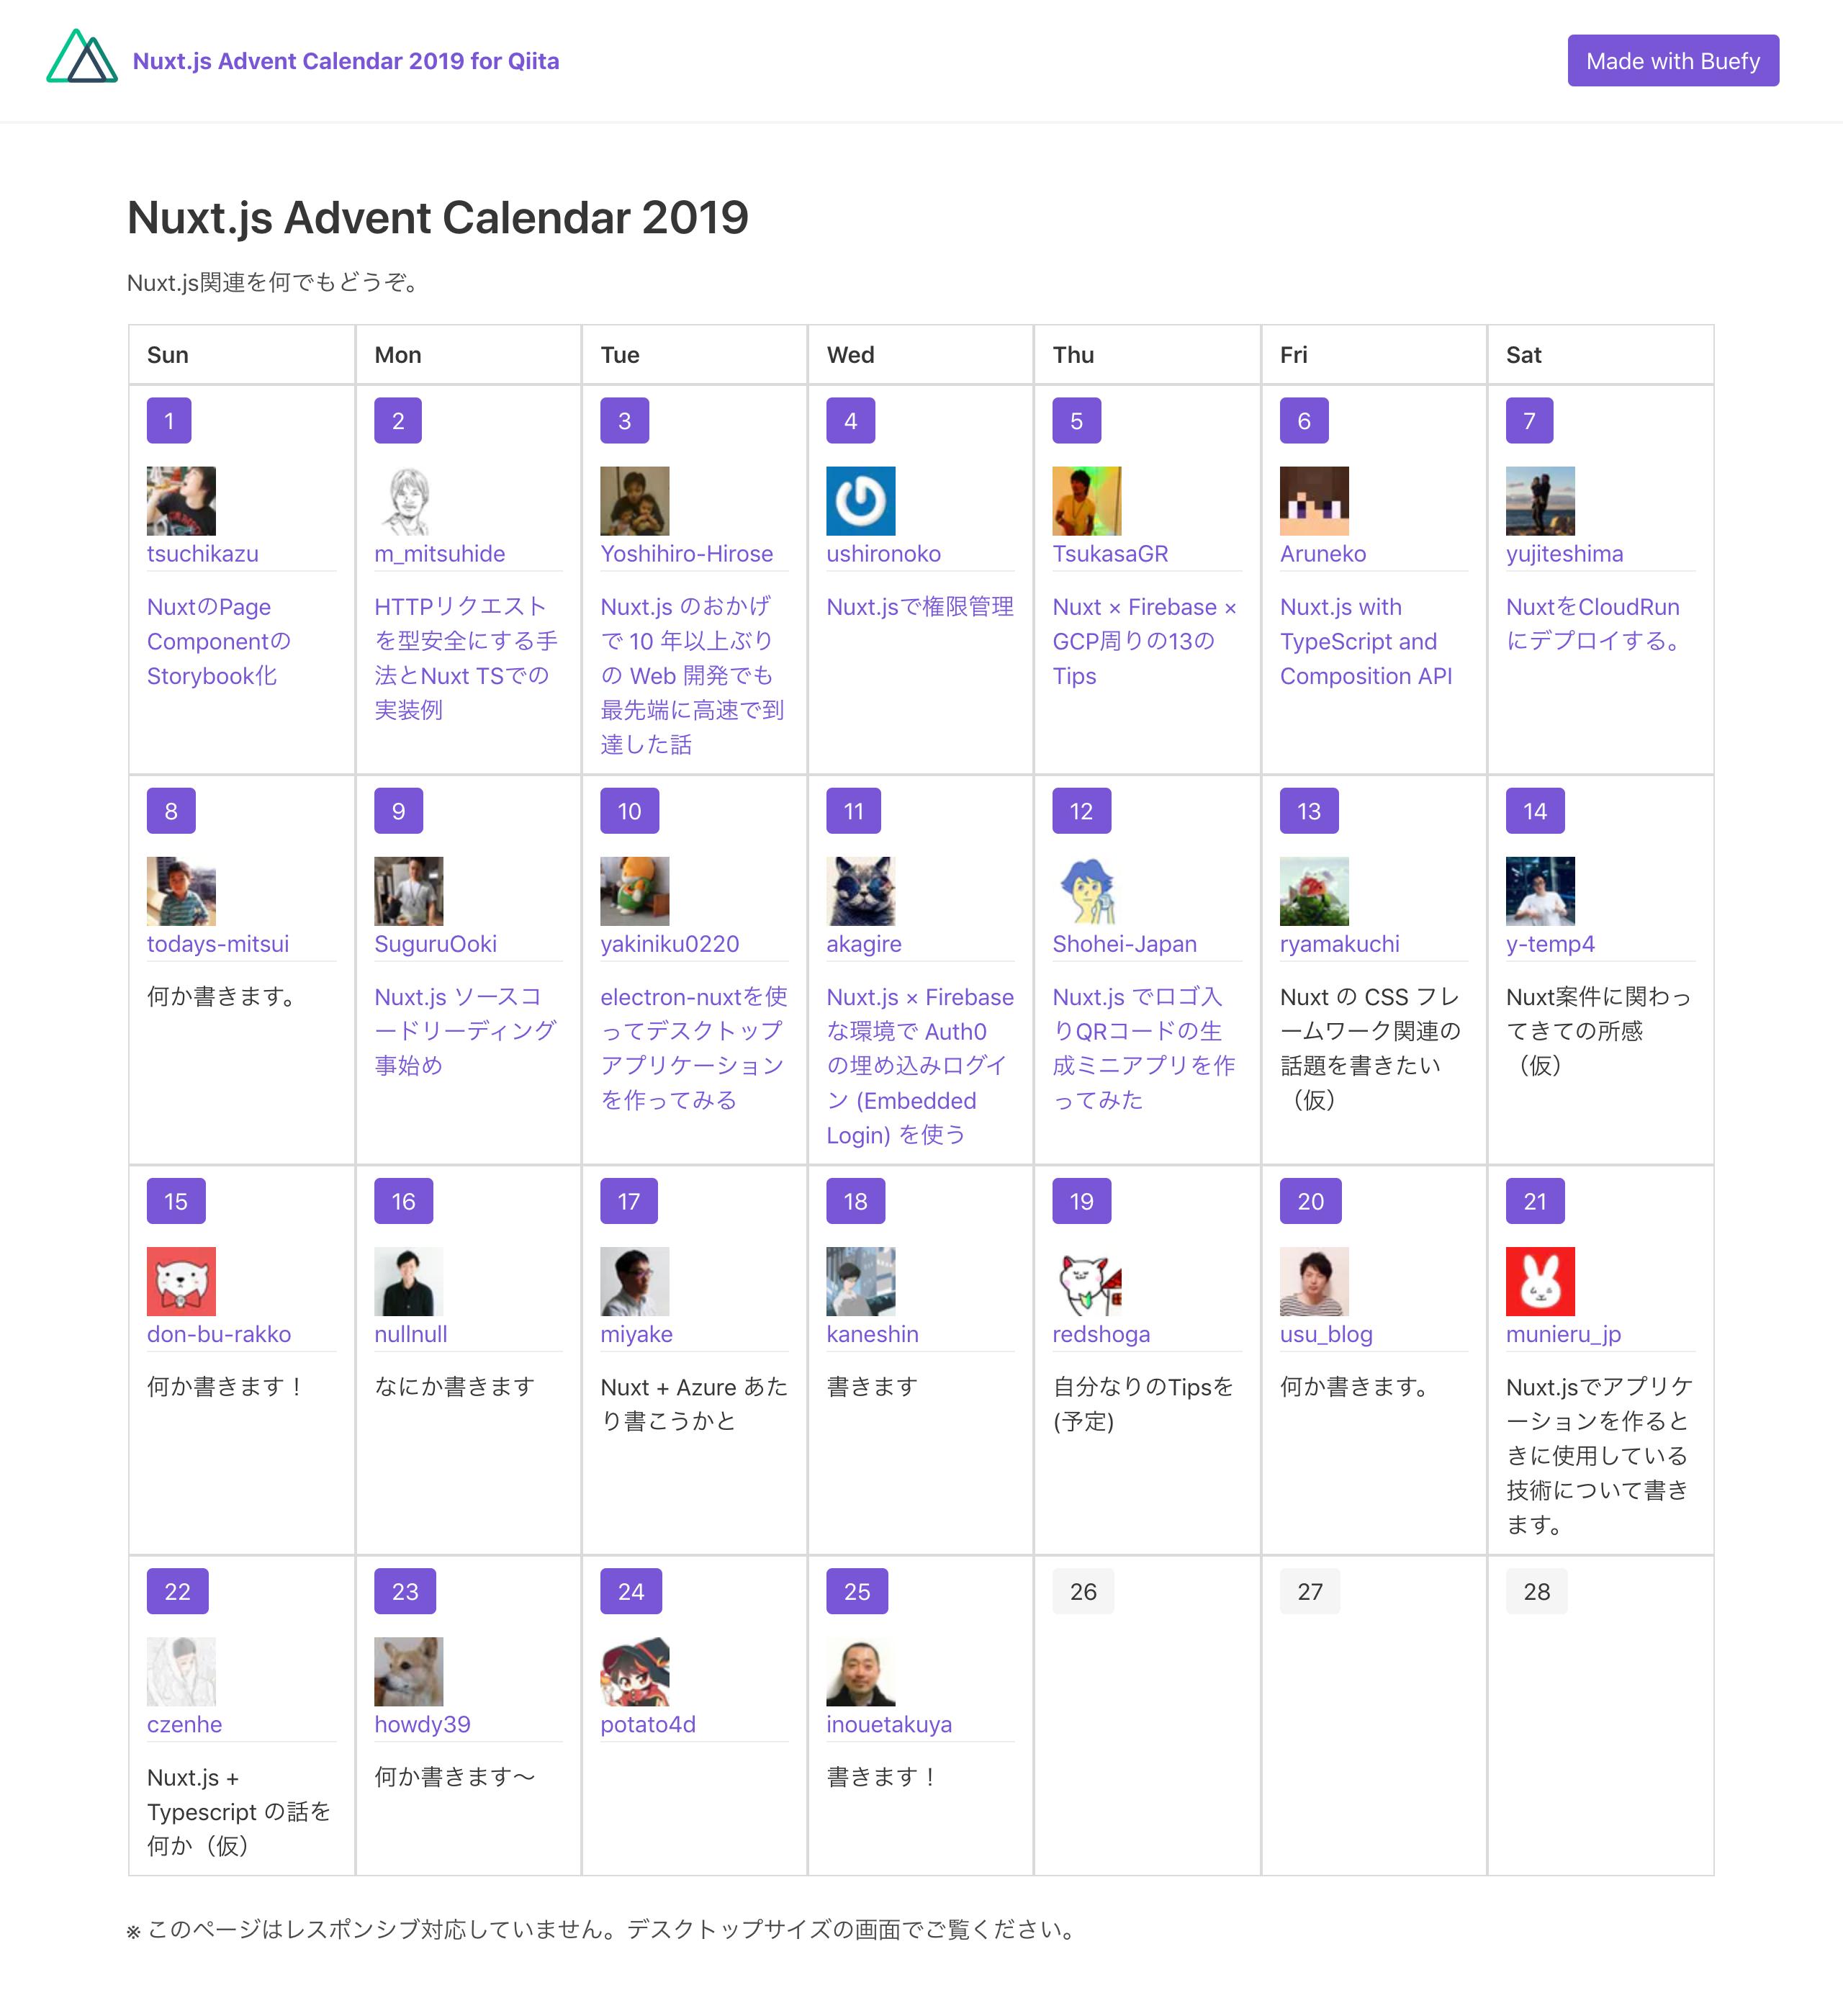 advent-calendar-2019-buefy.netlify.com.png